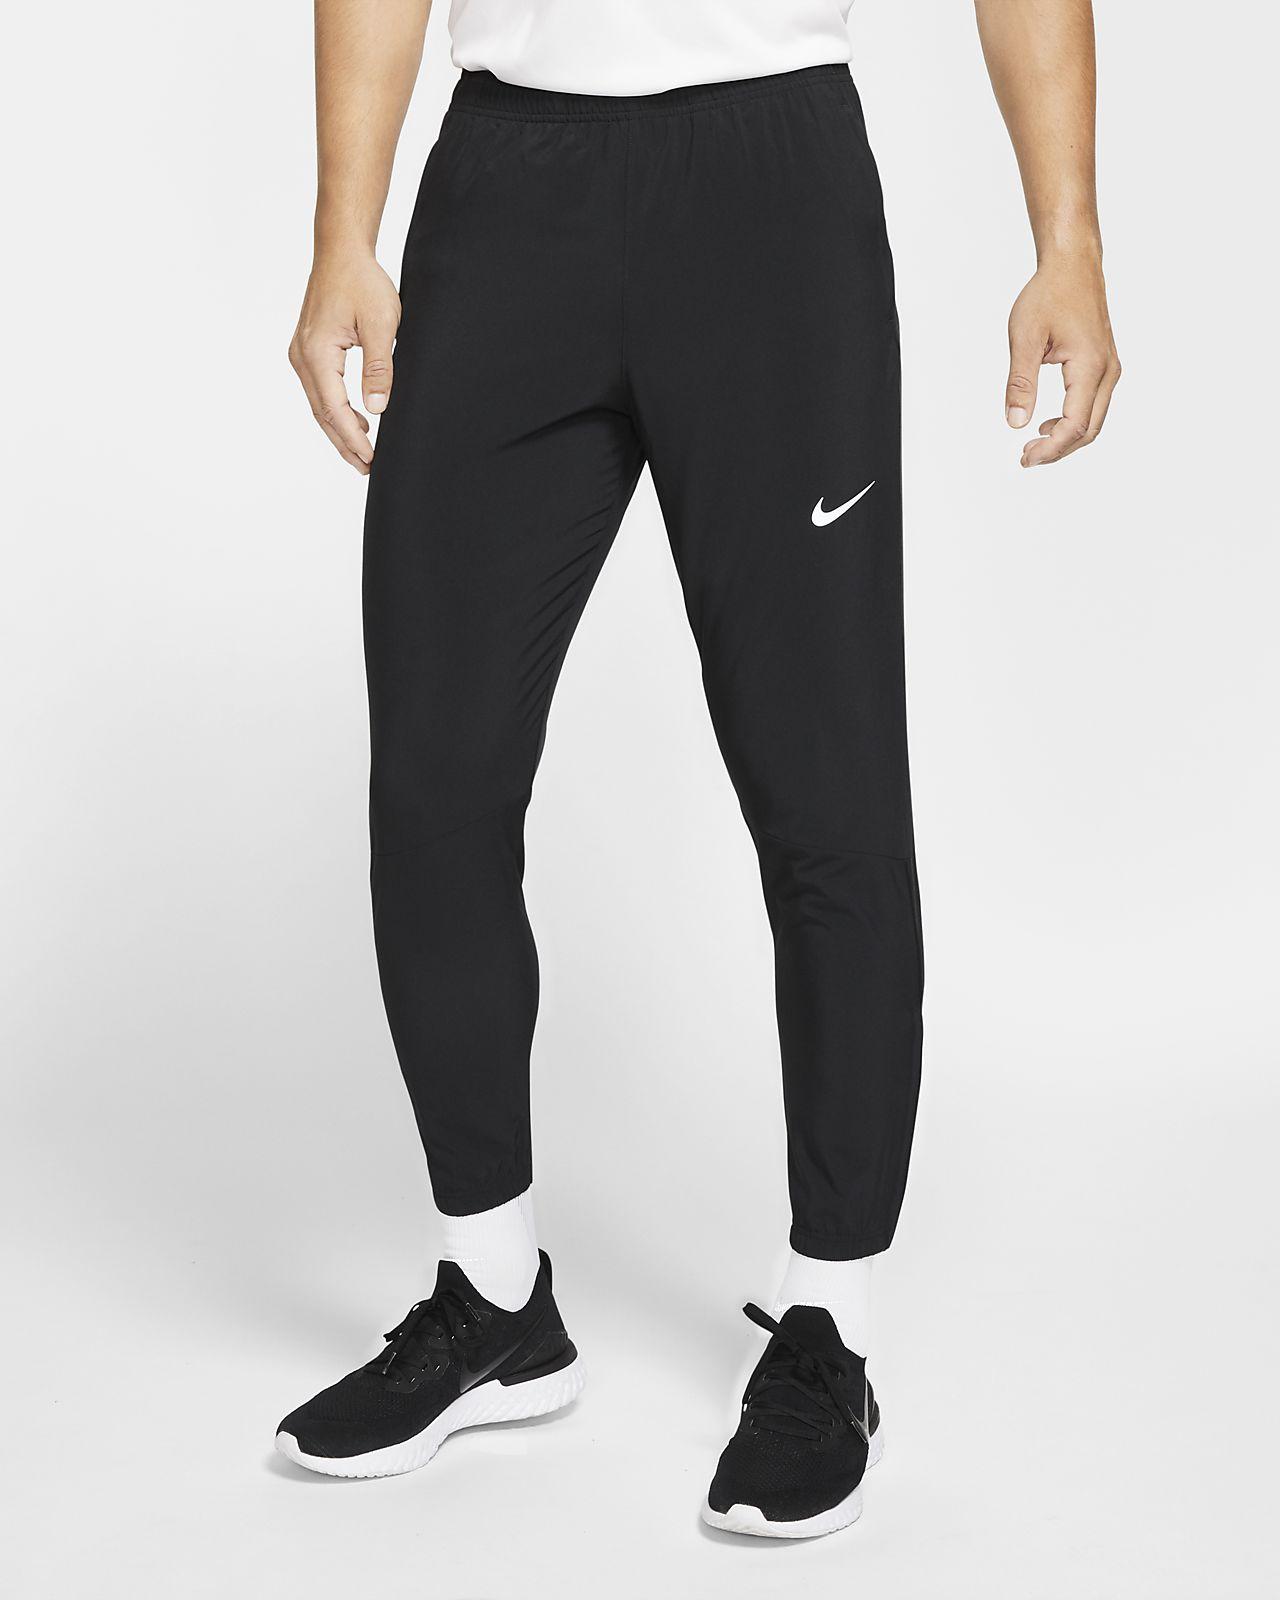 Nike Essential Pantalons de running de teixit Woven - Home